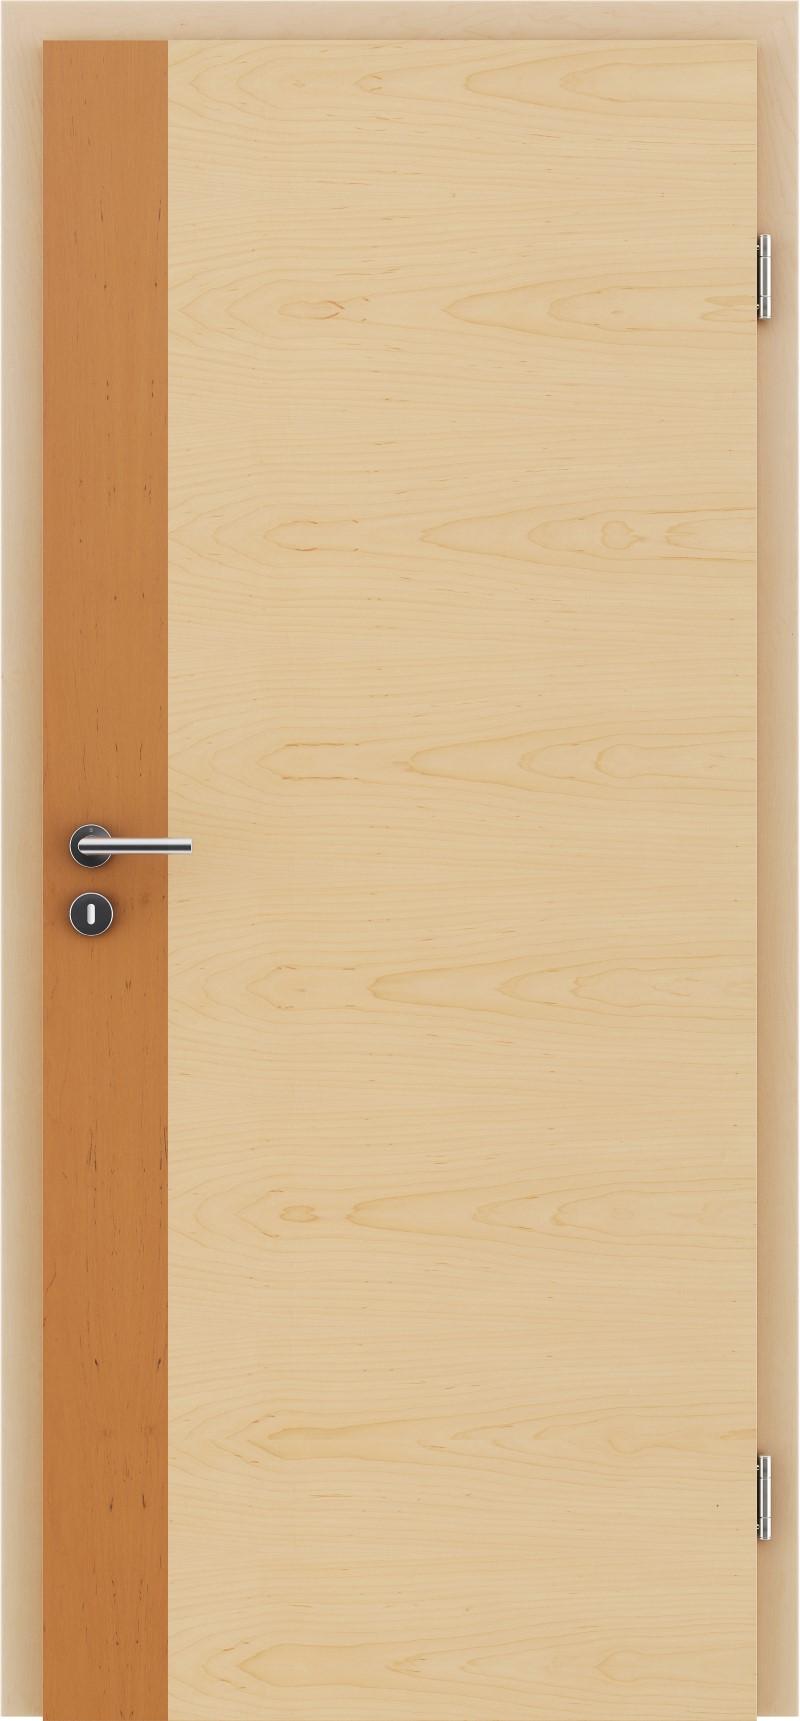 Plné dvere Vivaceline